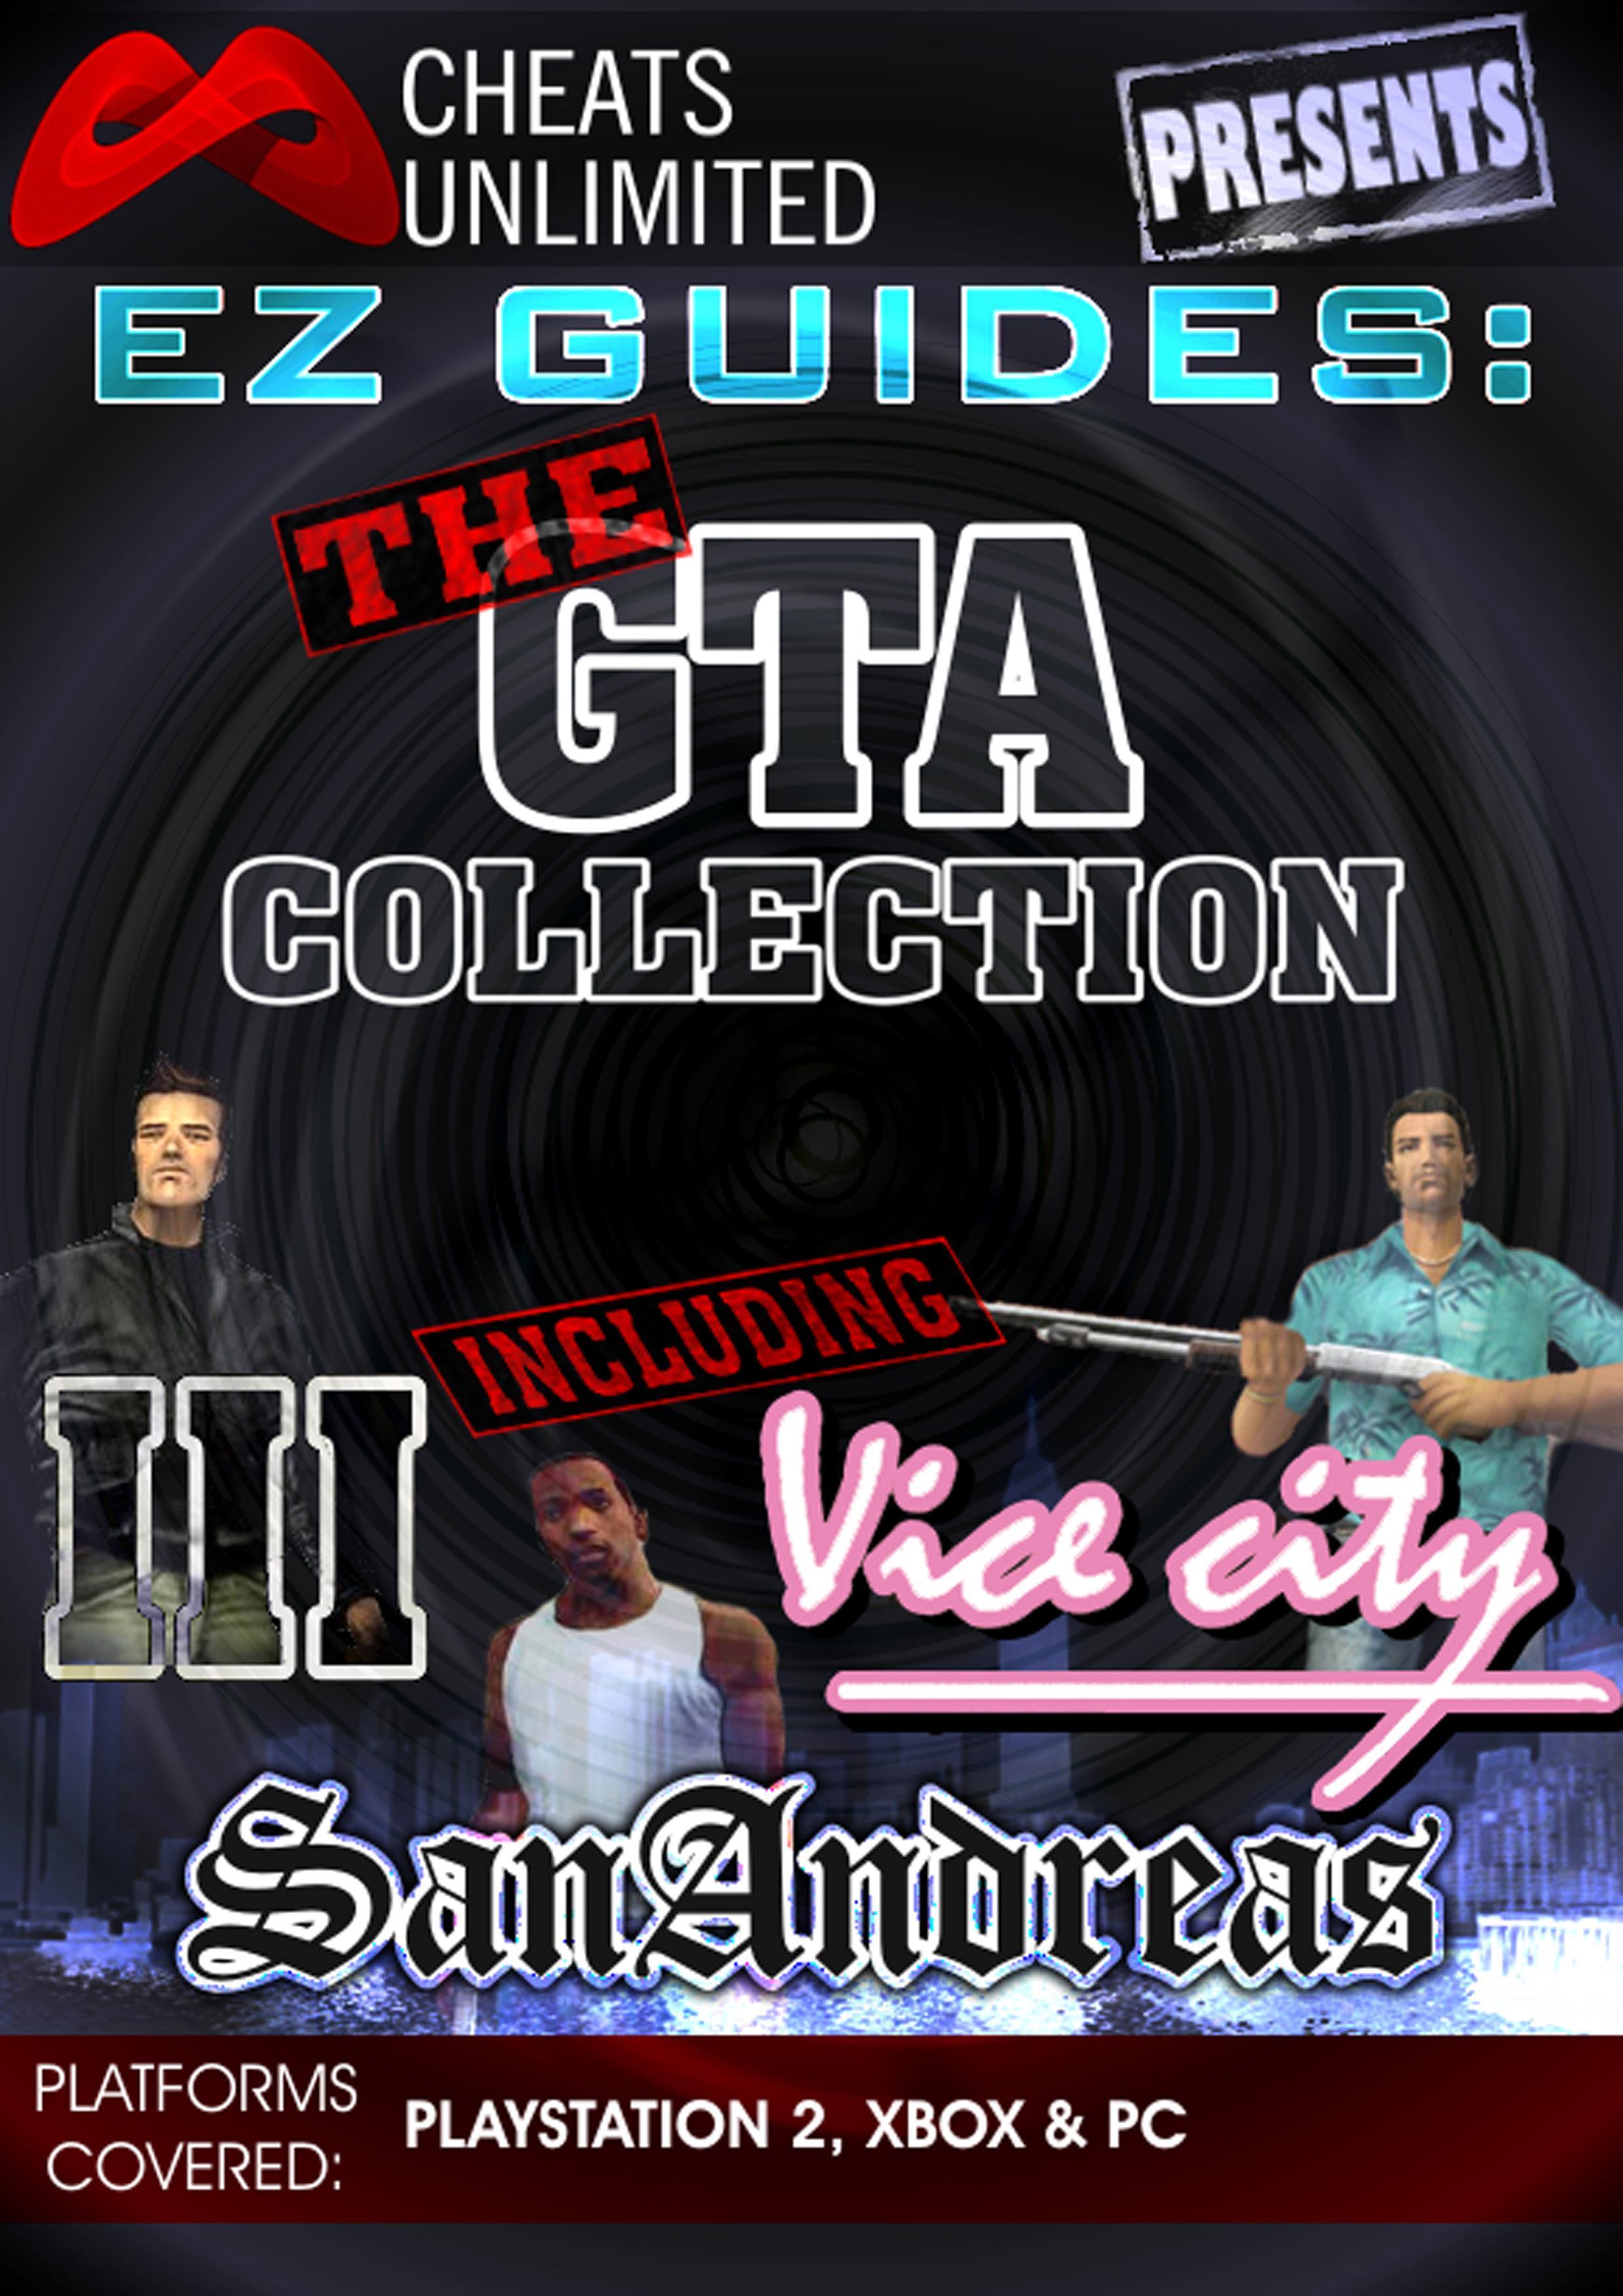 Cheats Unlimited presents EZ Guides EB2370004210278